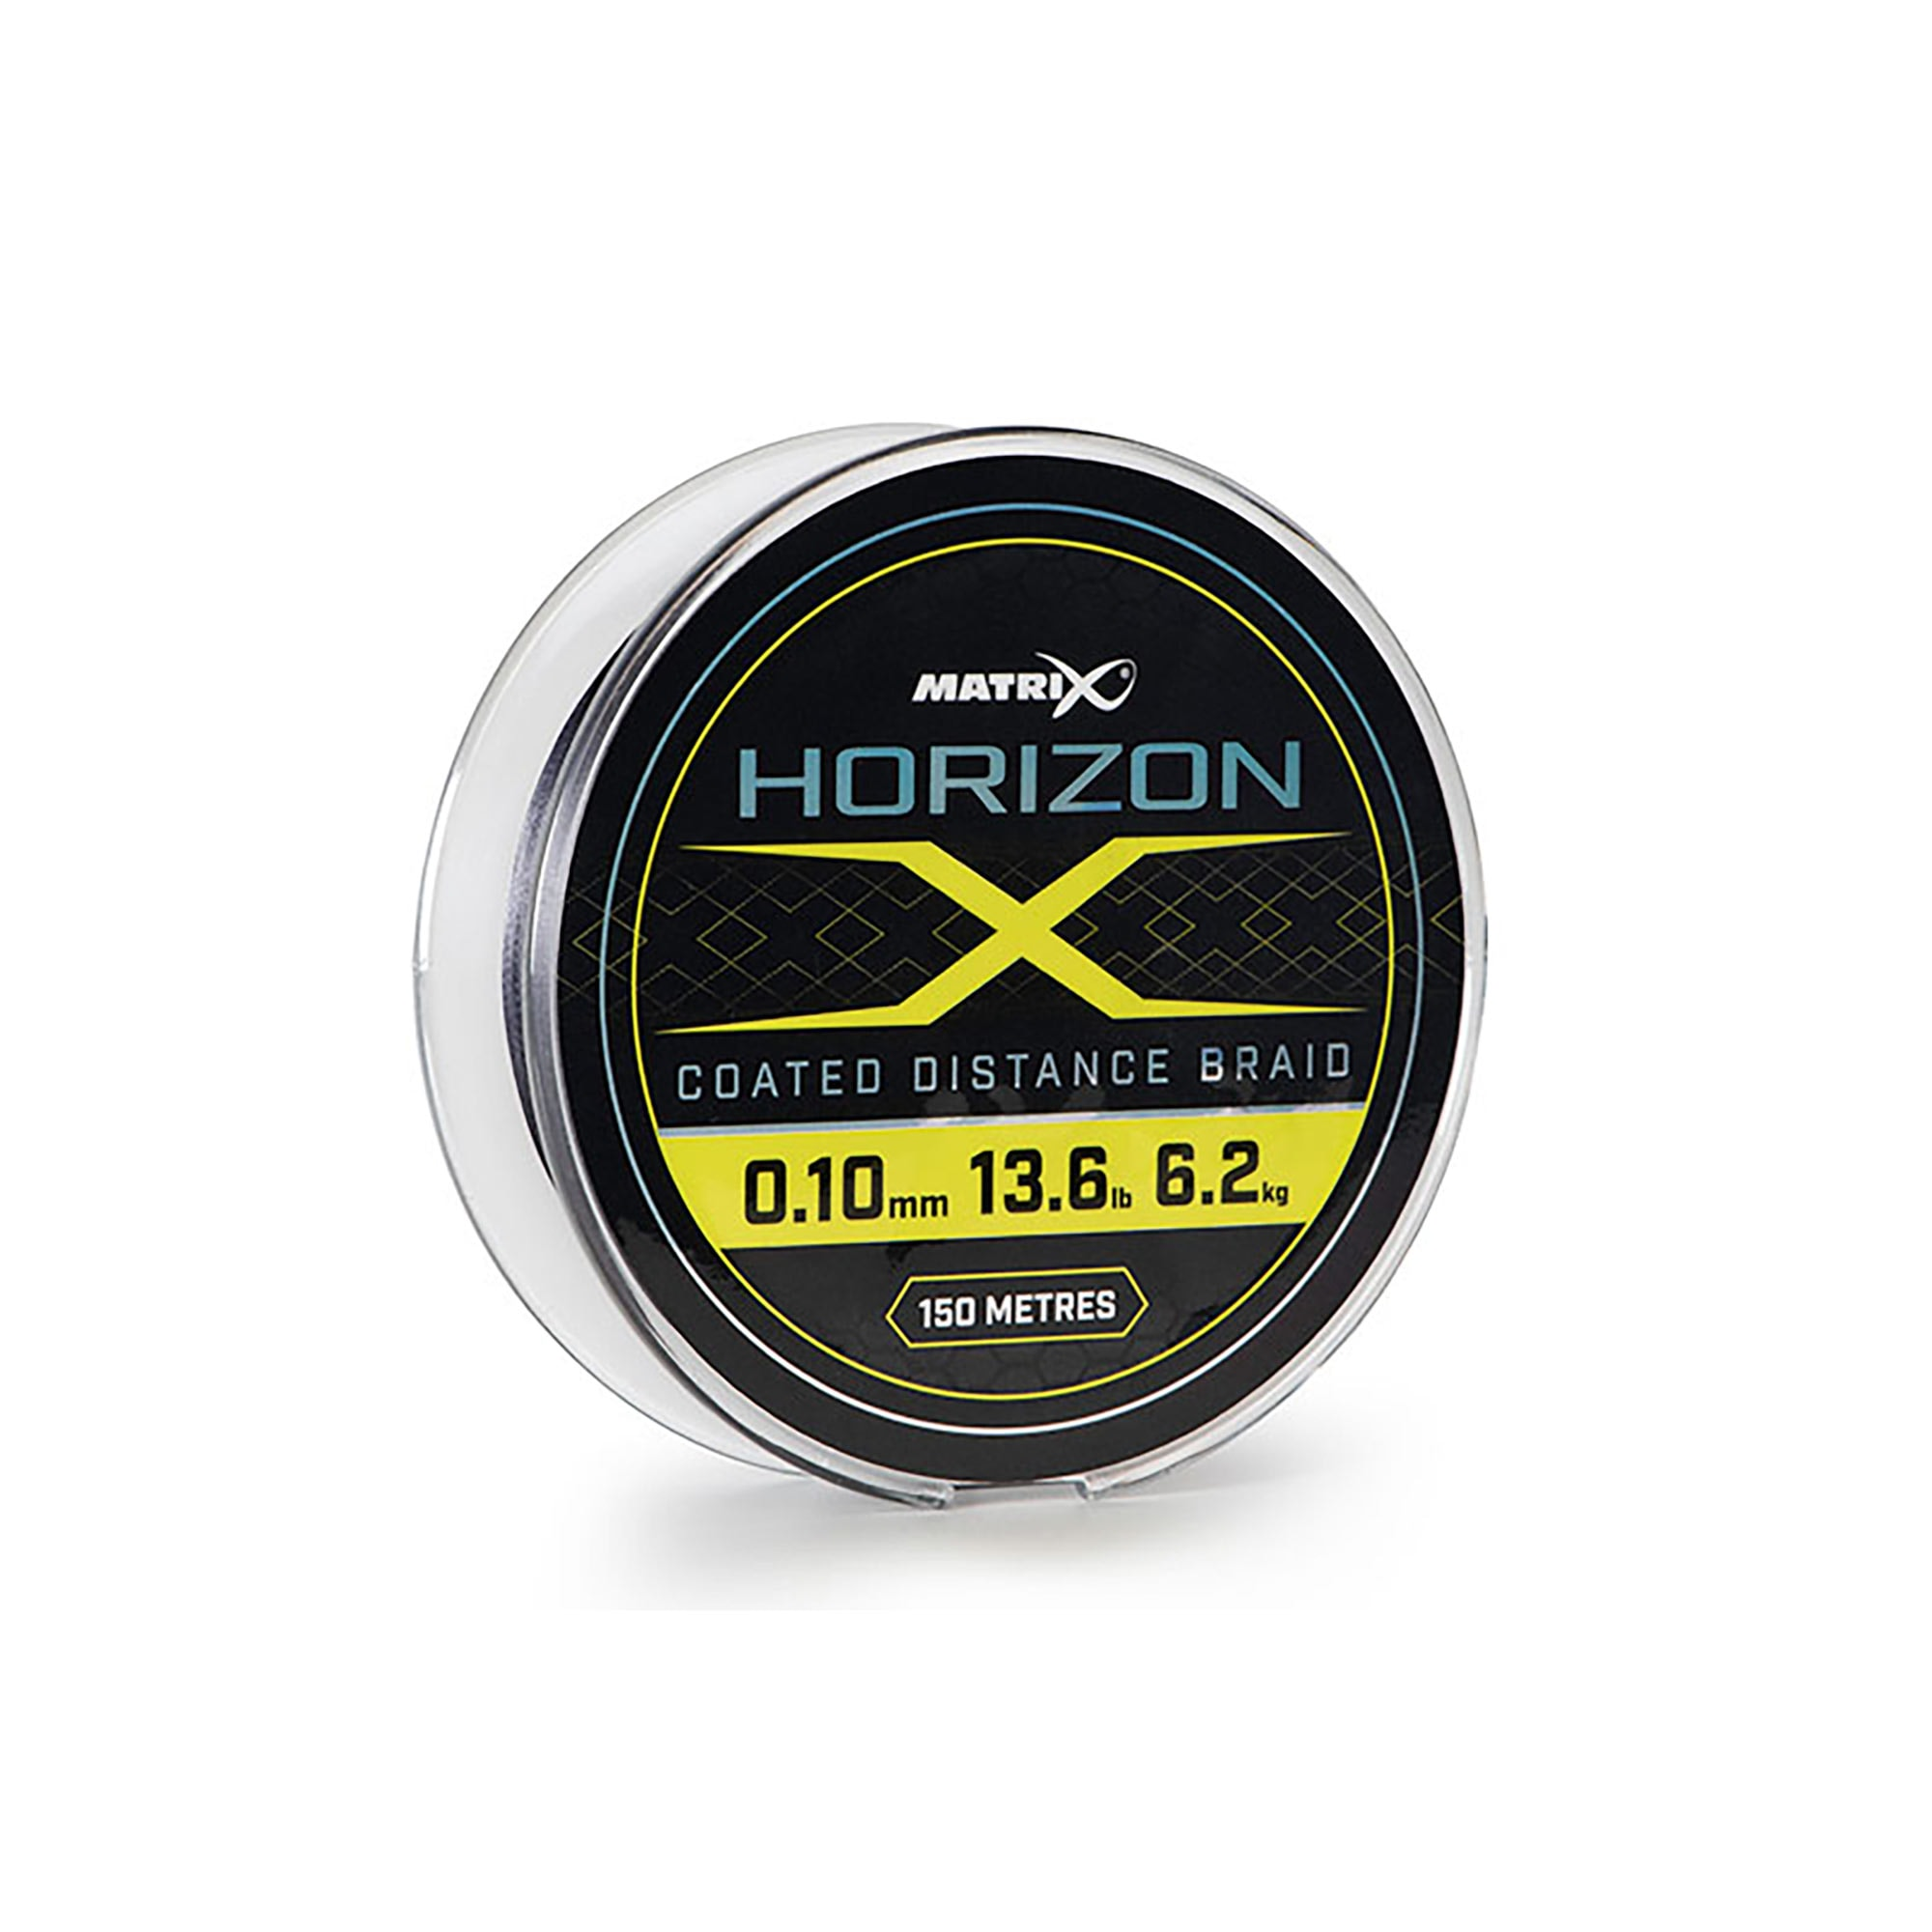 Trecciato Horizon X Coated Braid (8 fili) MATRIX 150 mt